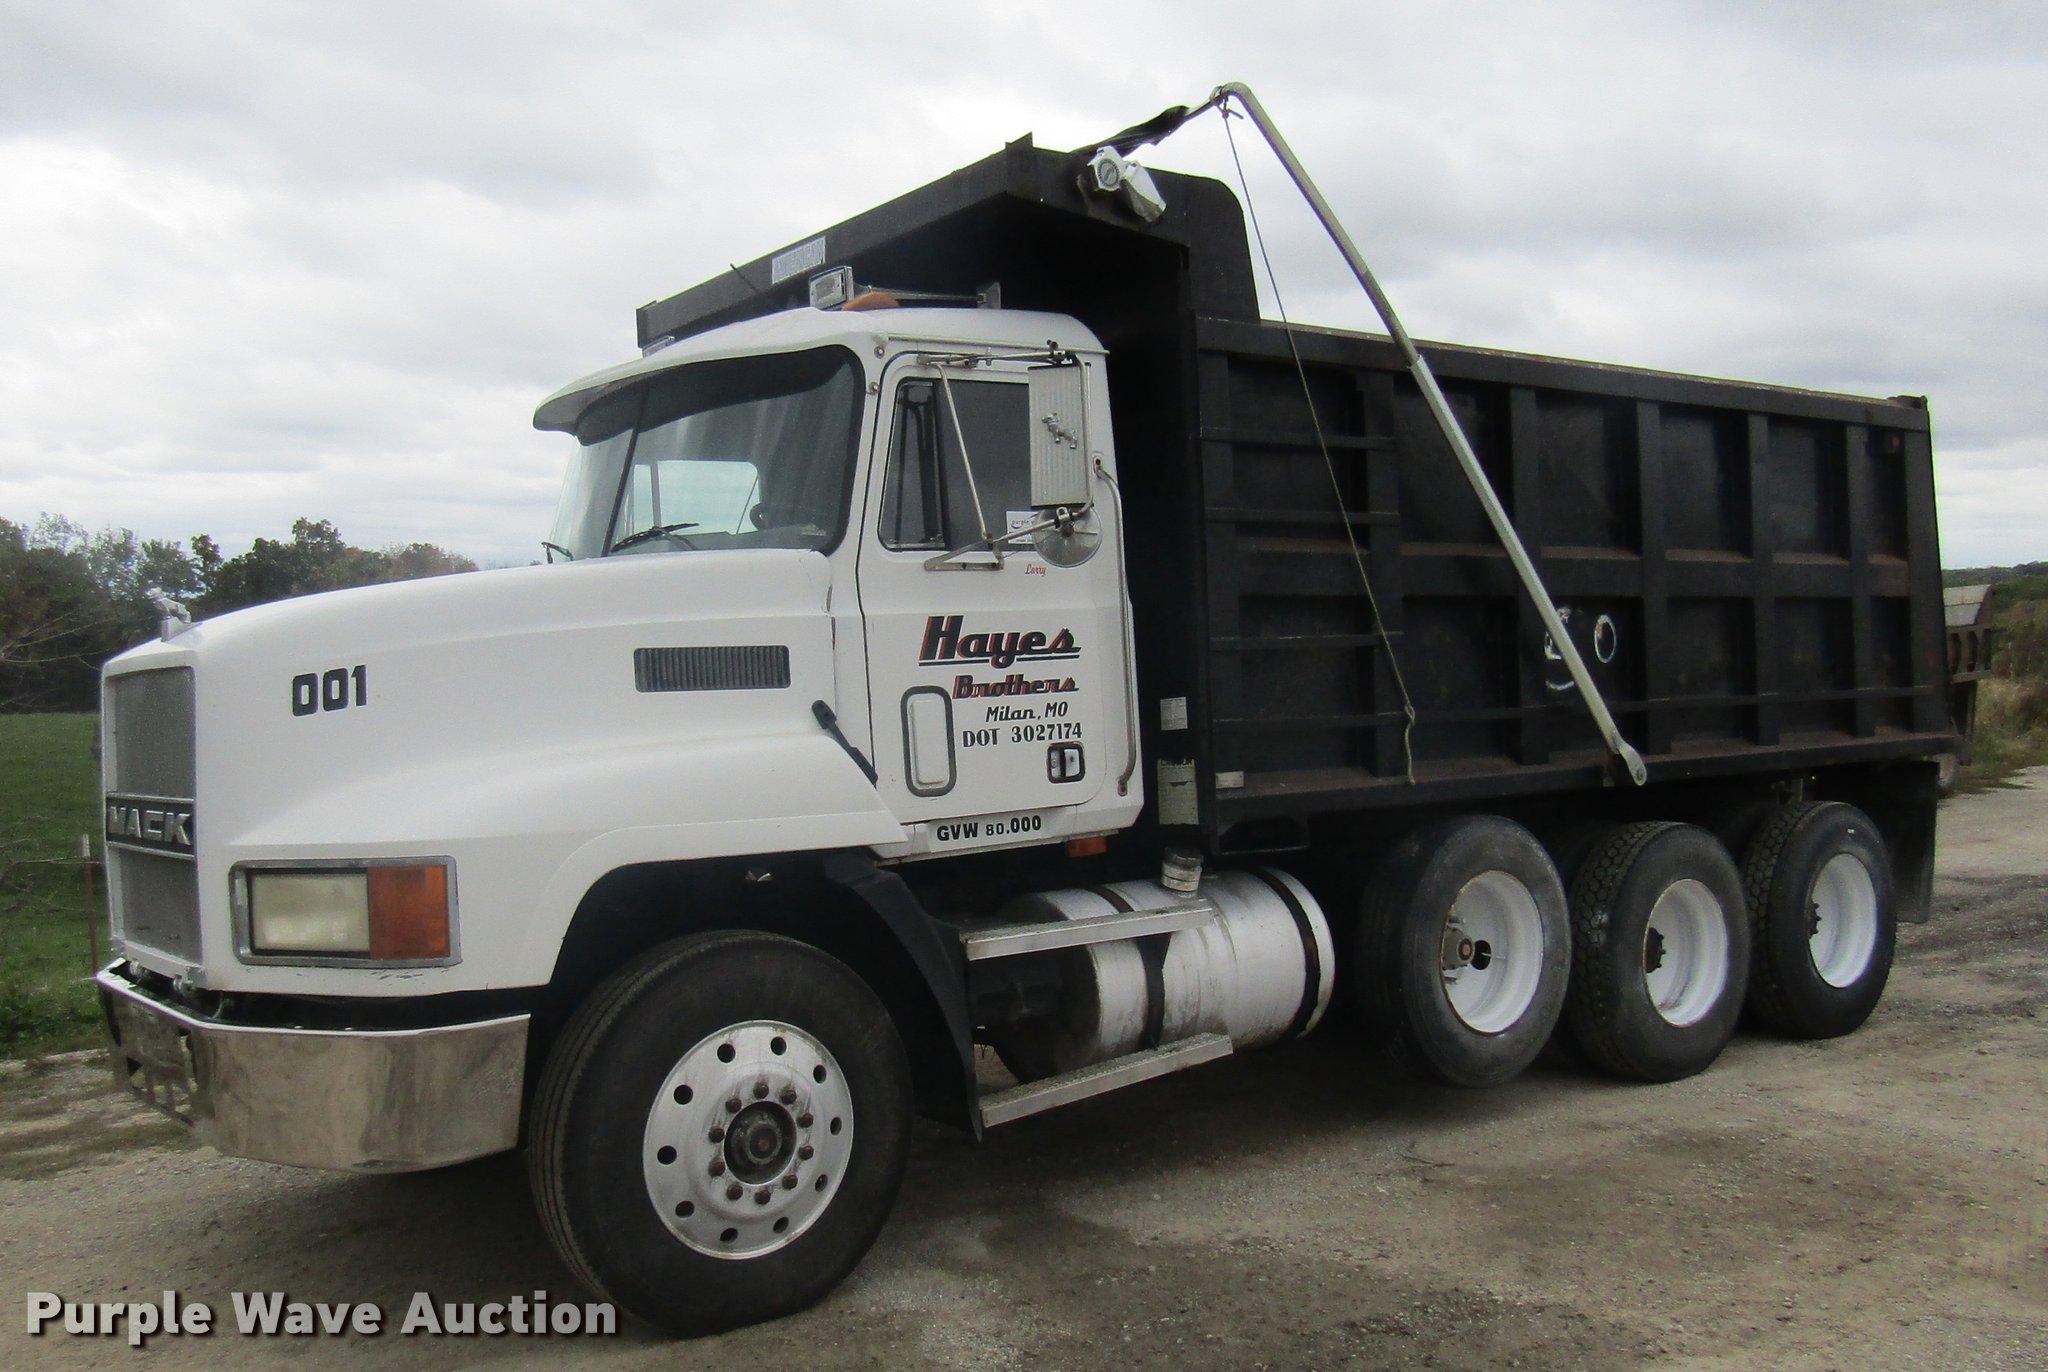 Mack Dump Truck Trailer Wiring - Wiring Diagrams Interval Mack Garbage Truck Wiring Diagram on